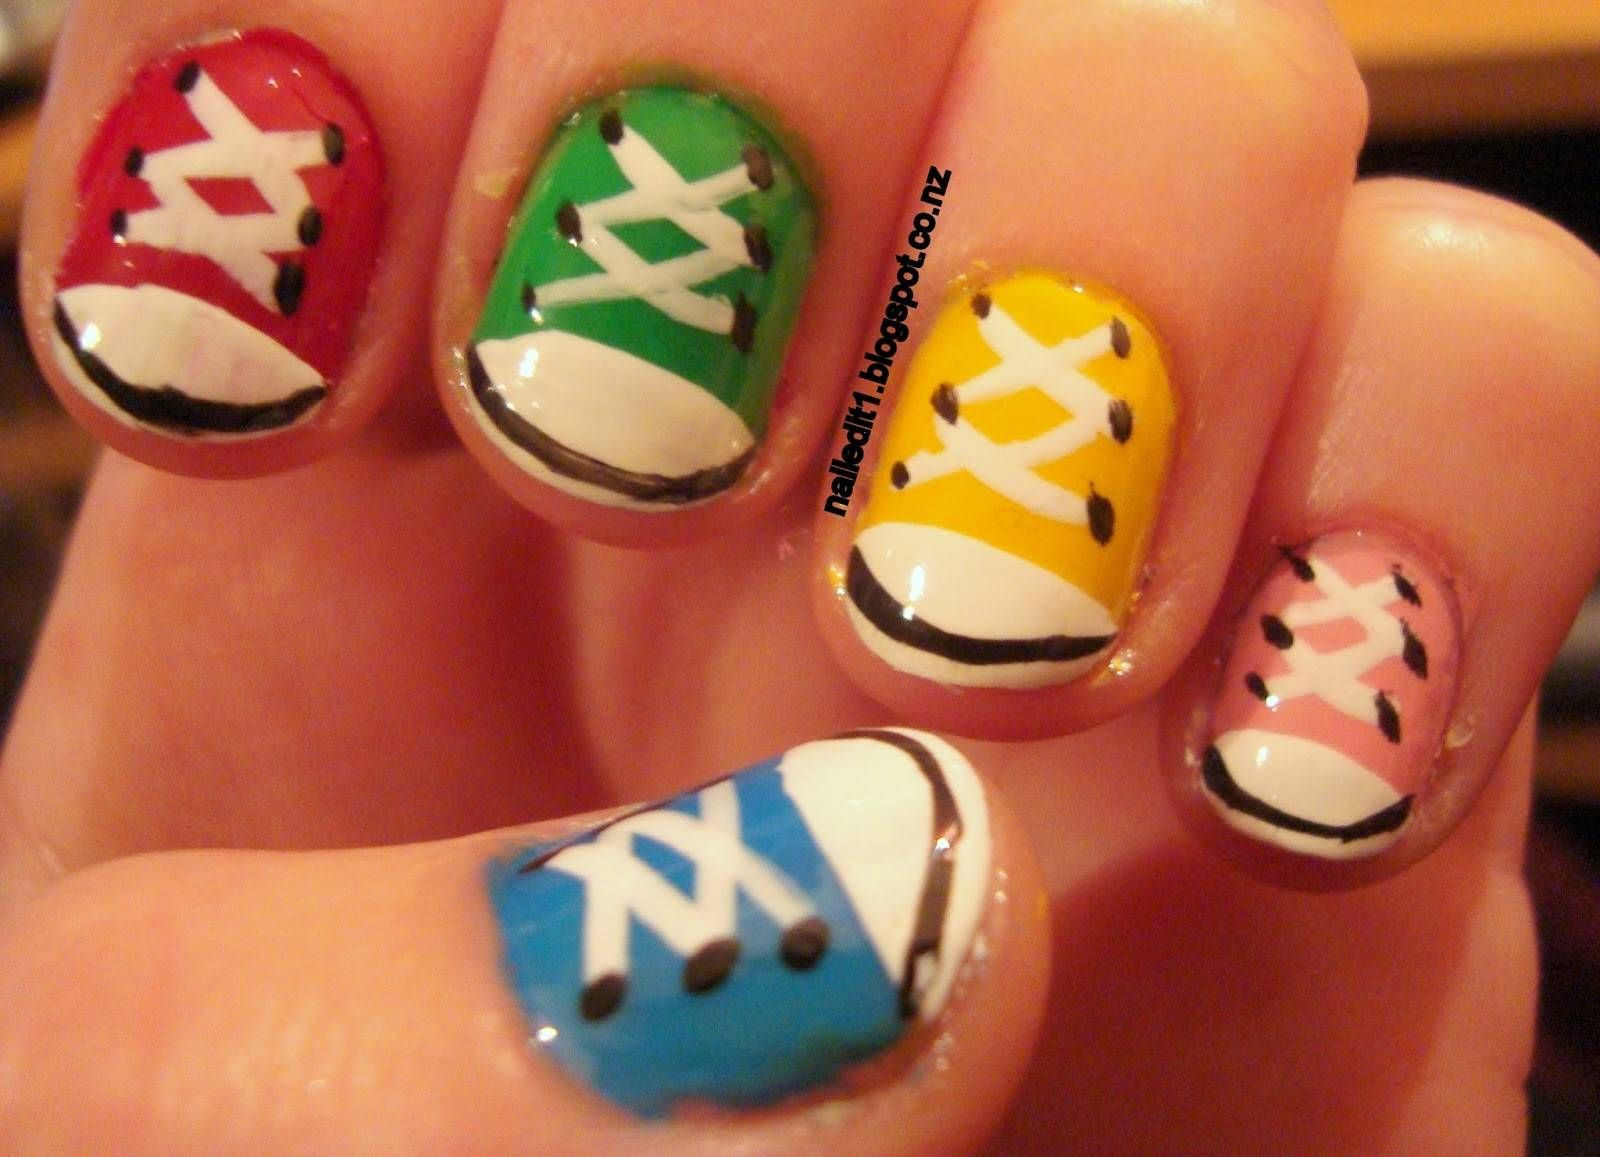 fingernail designs for short nails | Nailed It NZ: Nail art for ...